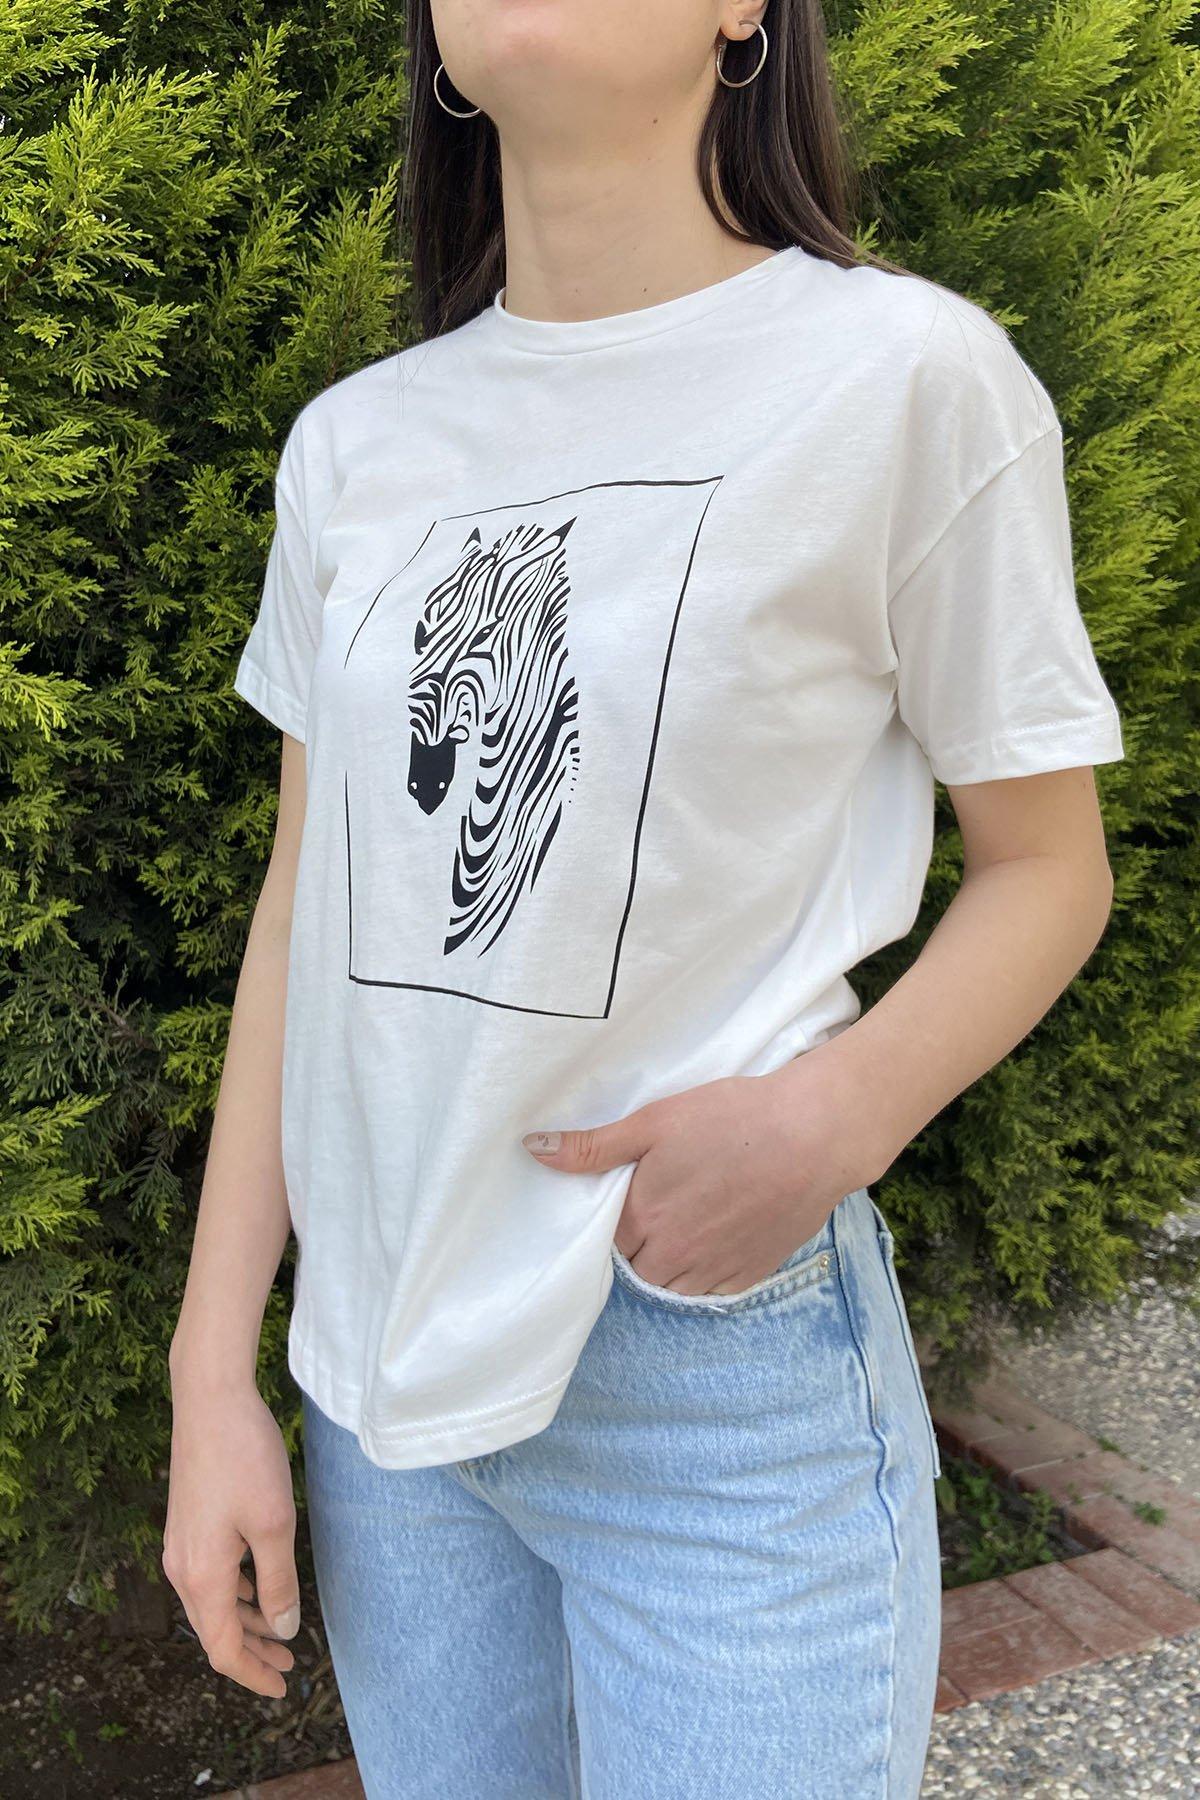 170 18959 Önü Zebra Baskı Tshirt